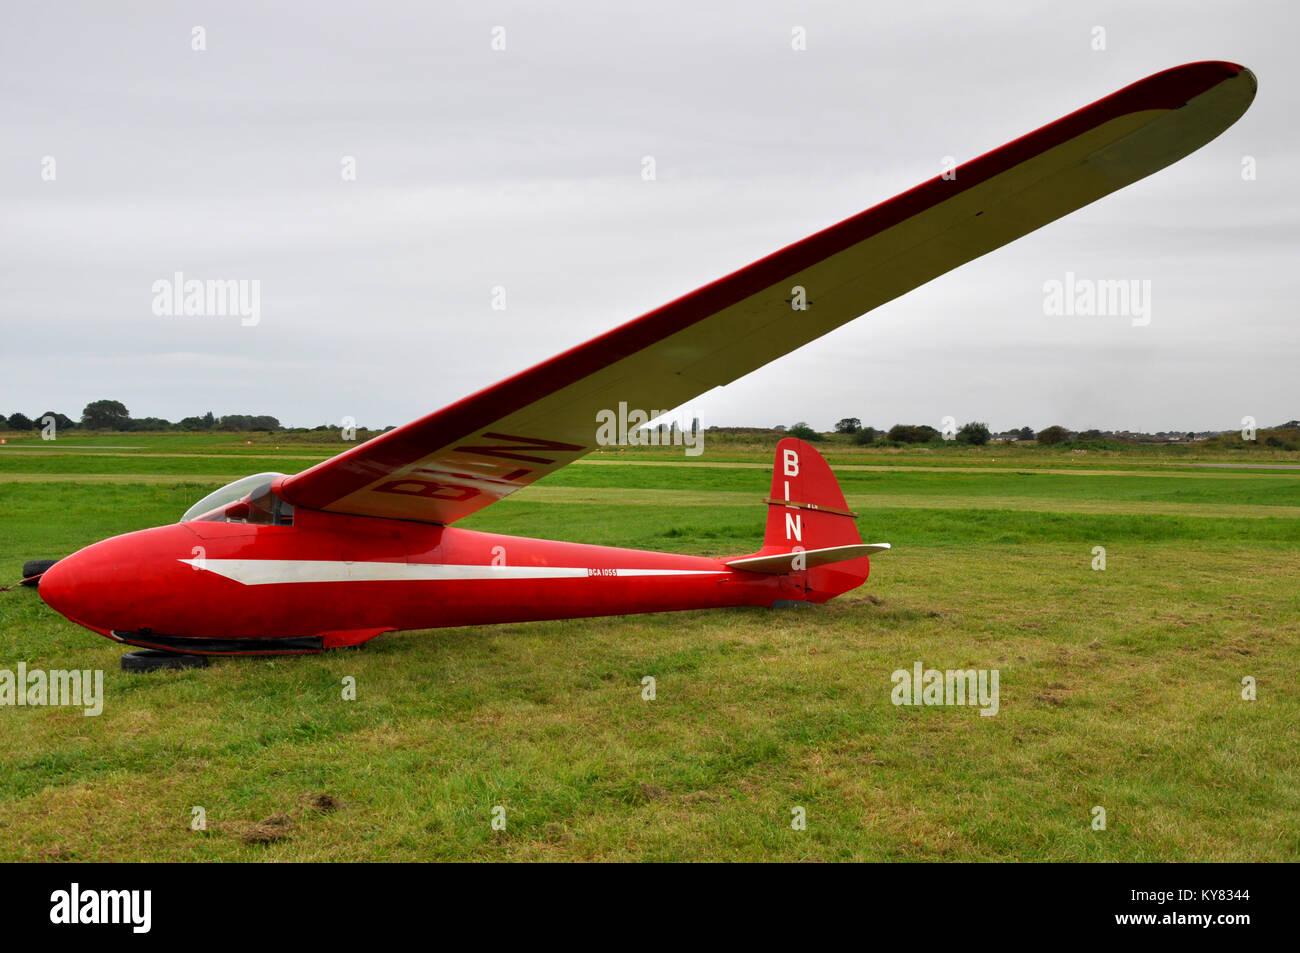 Elliotts of Newbury EoN Olympia 2b vintage glider. Classic sailplane on the ground Stock Photo